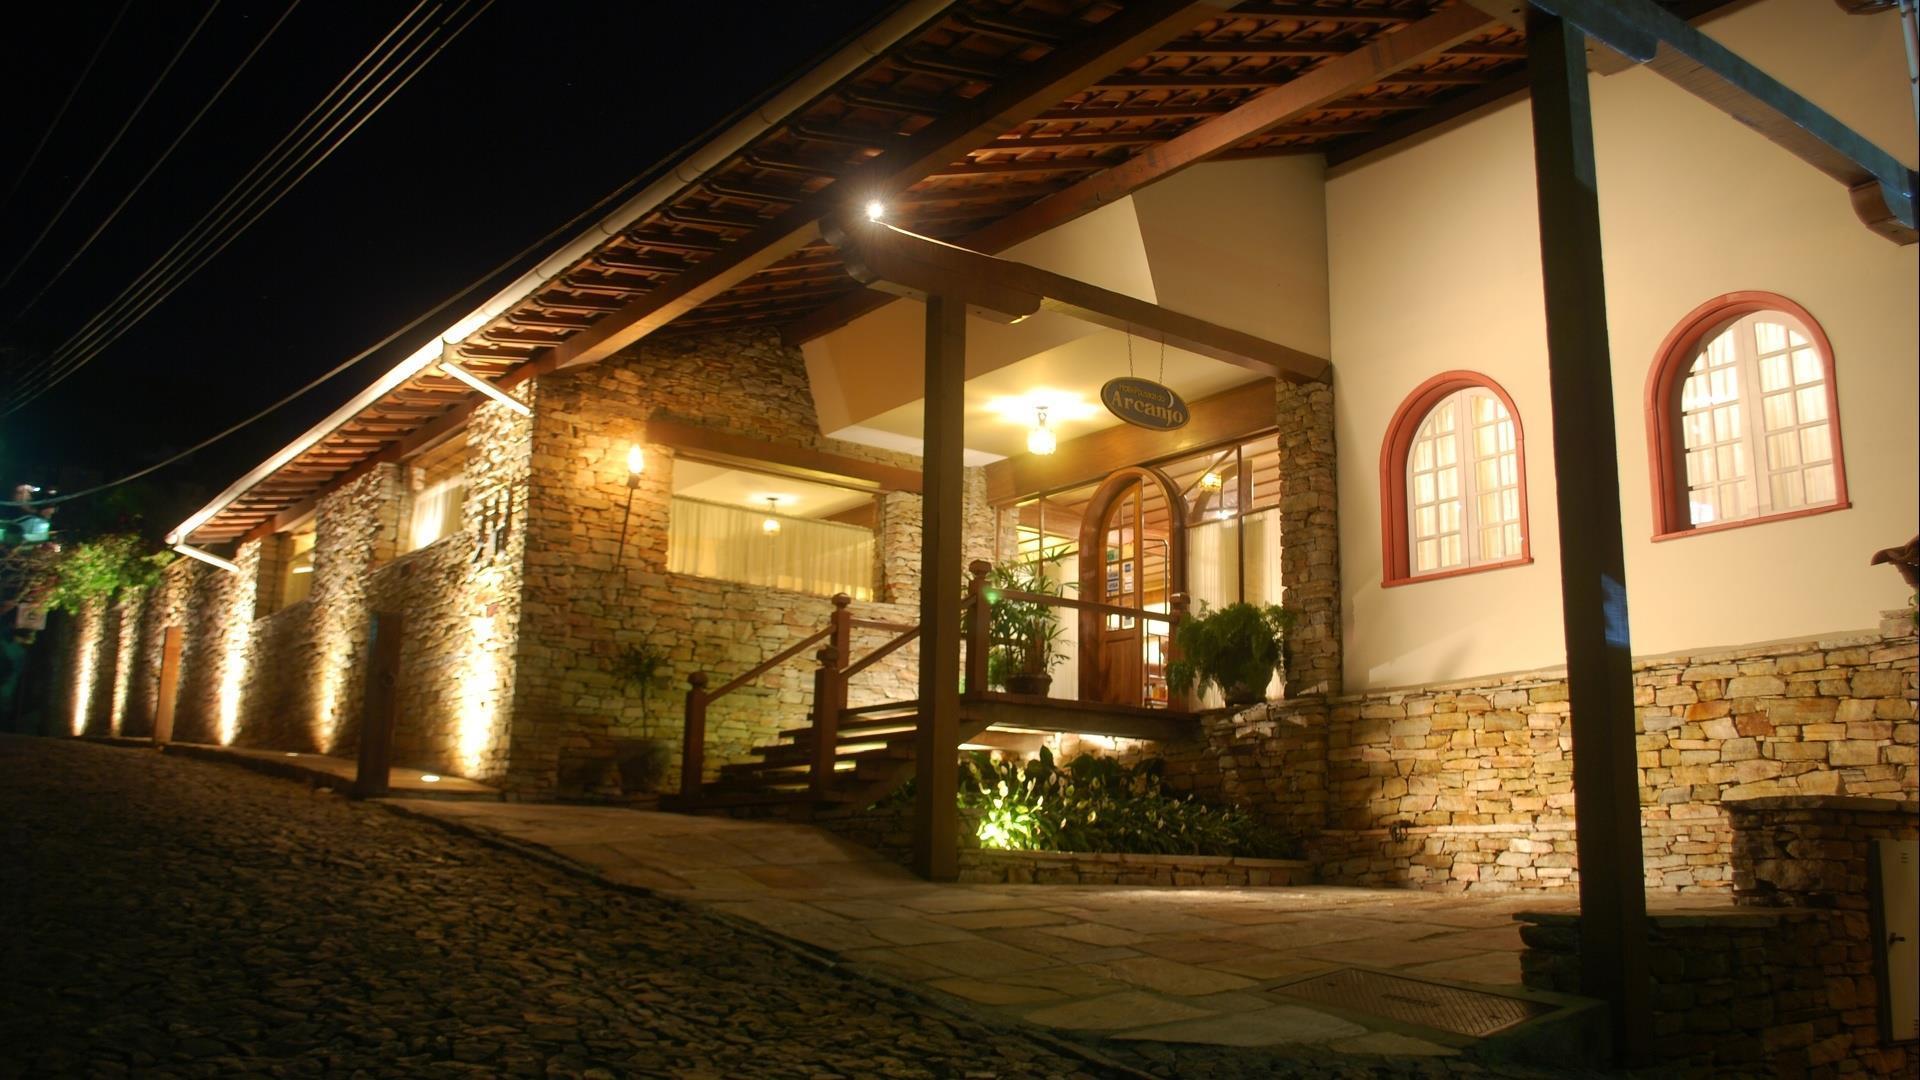 Brasilien Ouro Preto: Landestypische Unterkunft - Pousada do Arcanjo